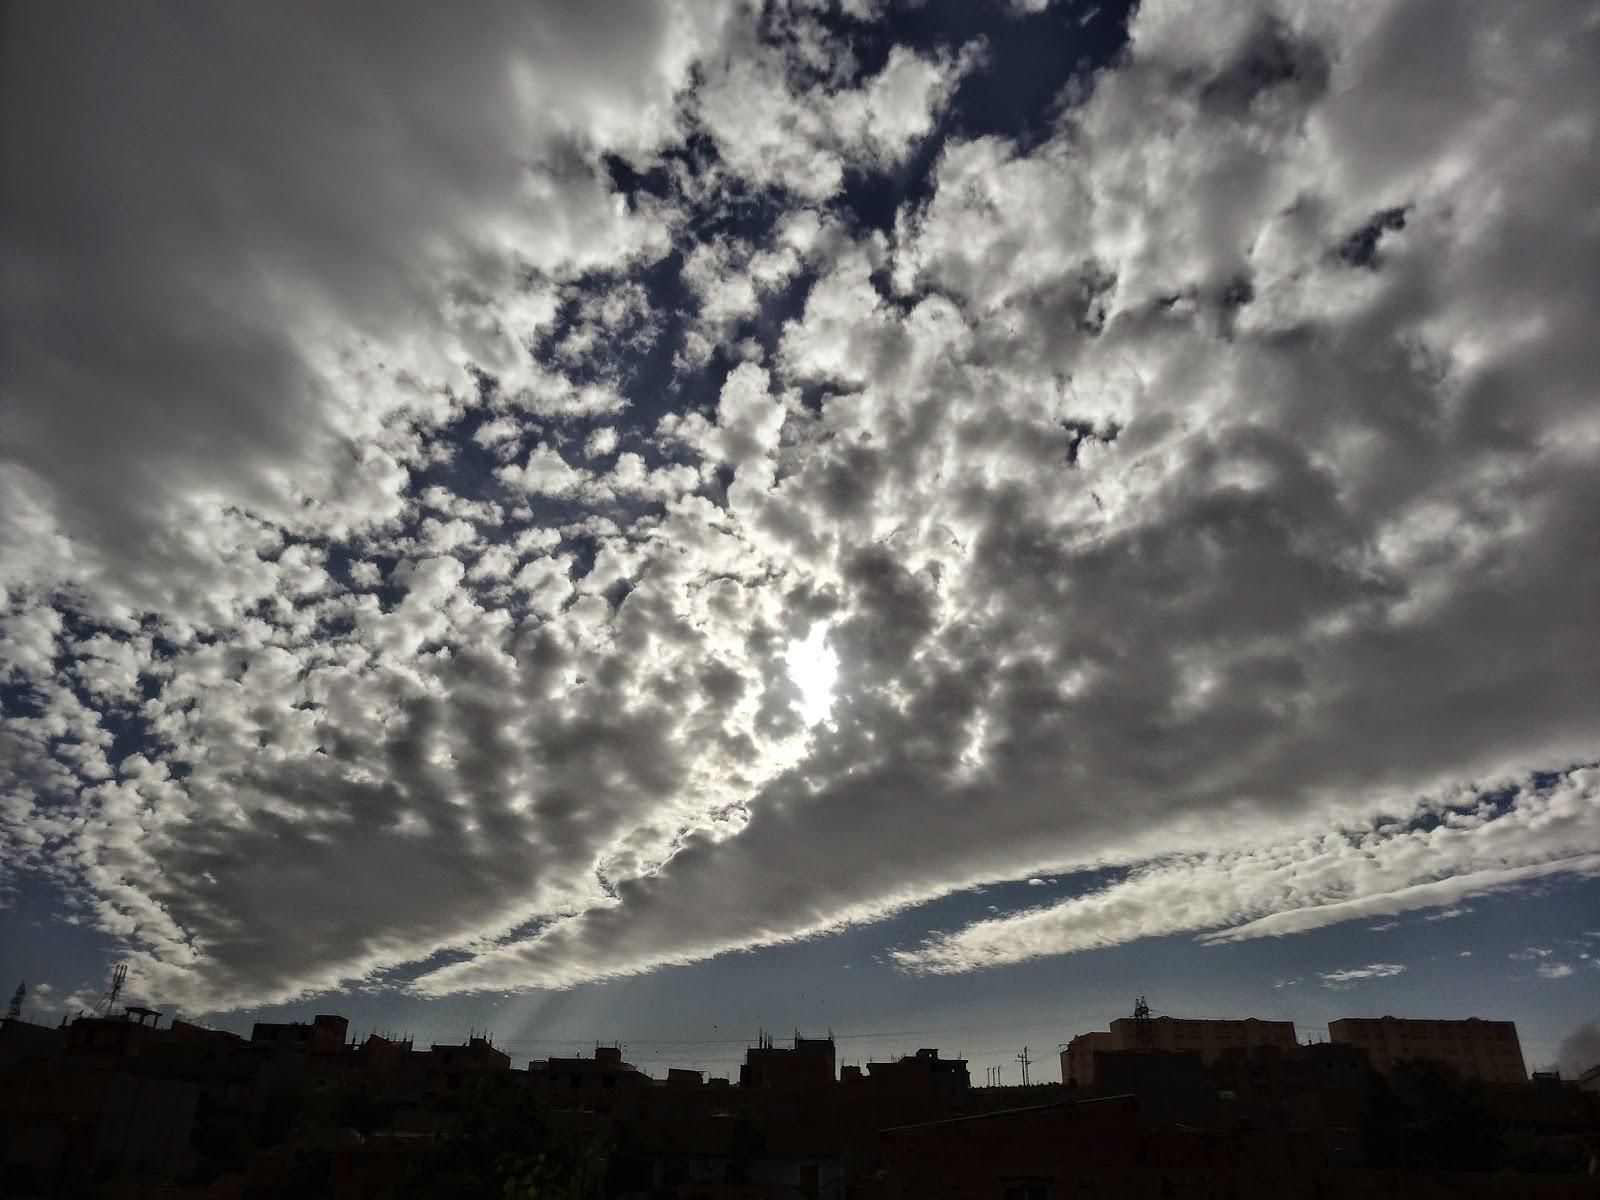 Sky and cloud wallpaper hd for desktop full screen flower 4k #Beautifulwallpaper hd for #photo # ...